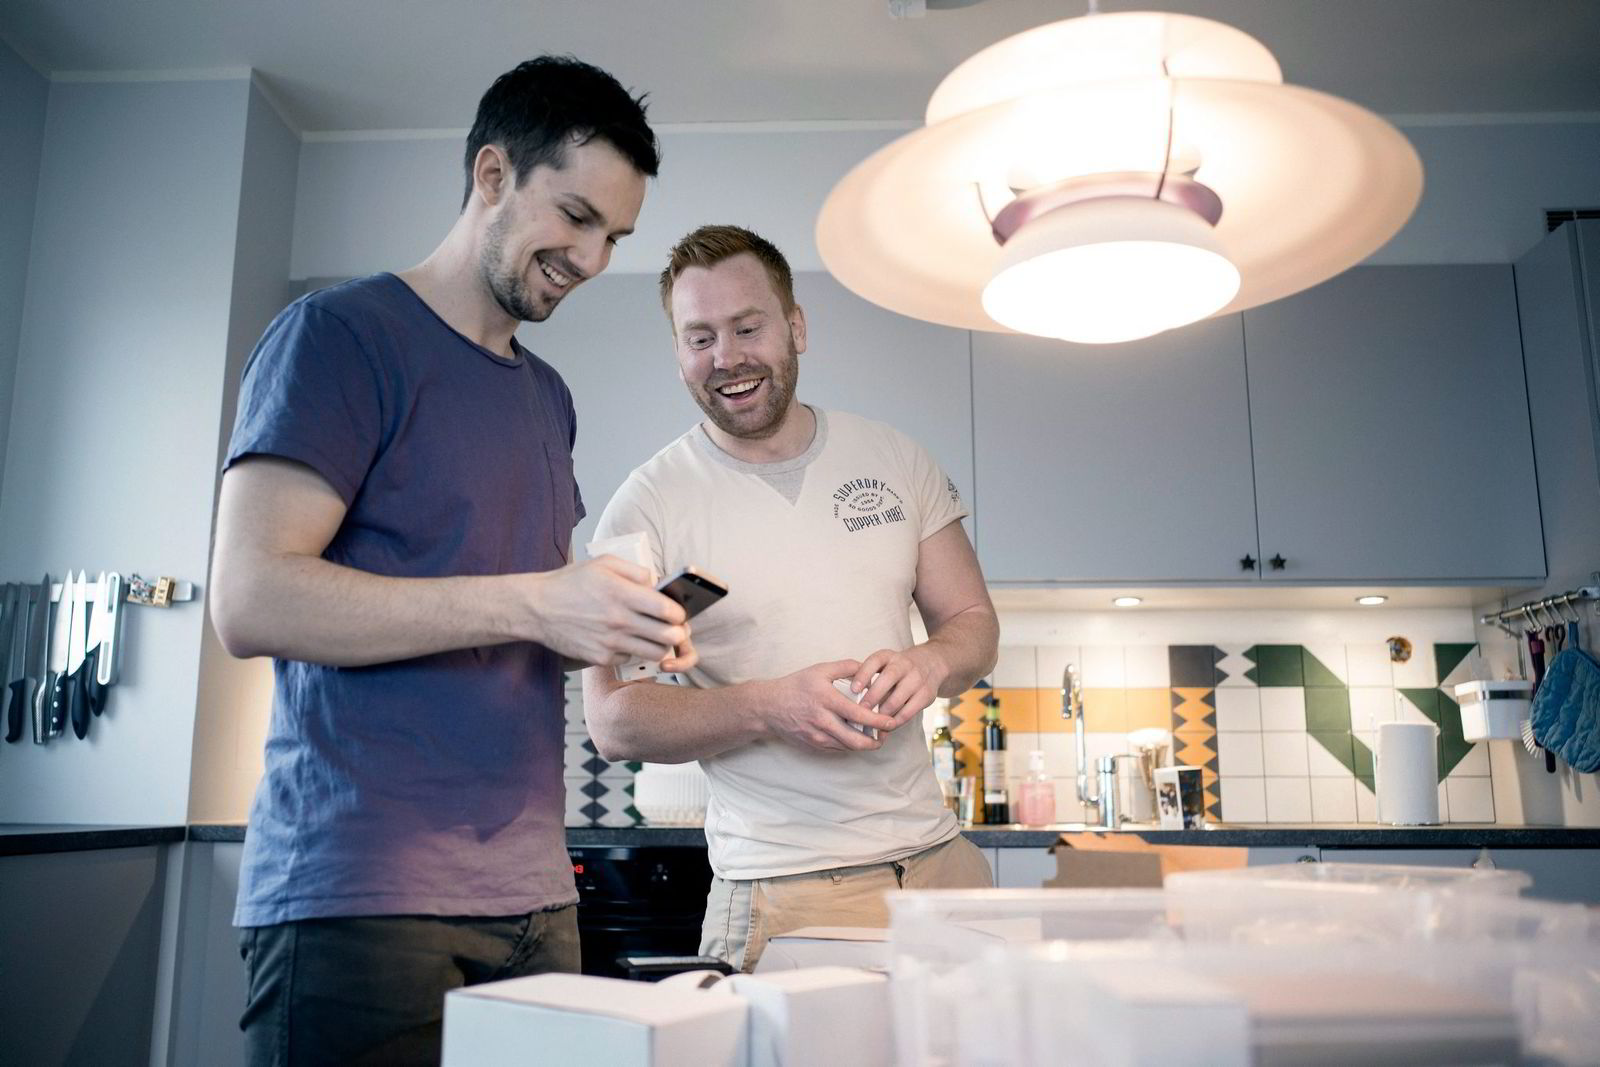 Gründer i Future Home, Erik Stokkeland (til høyre) er hjemme hos Tor Erik Skårdal i Sandnes og monterer utstyr til smarthus-løsning.